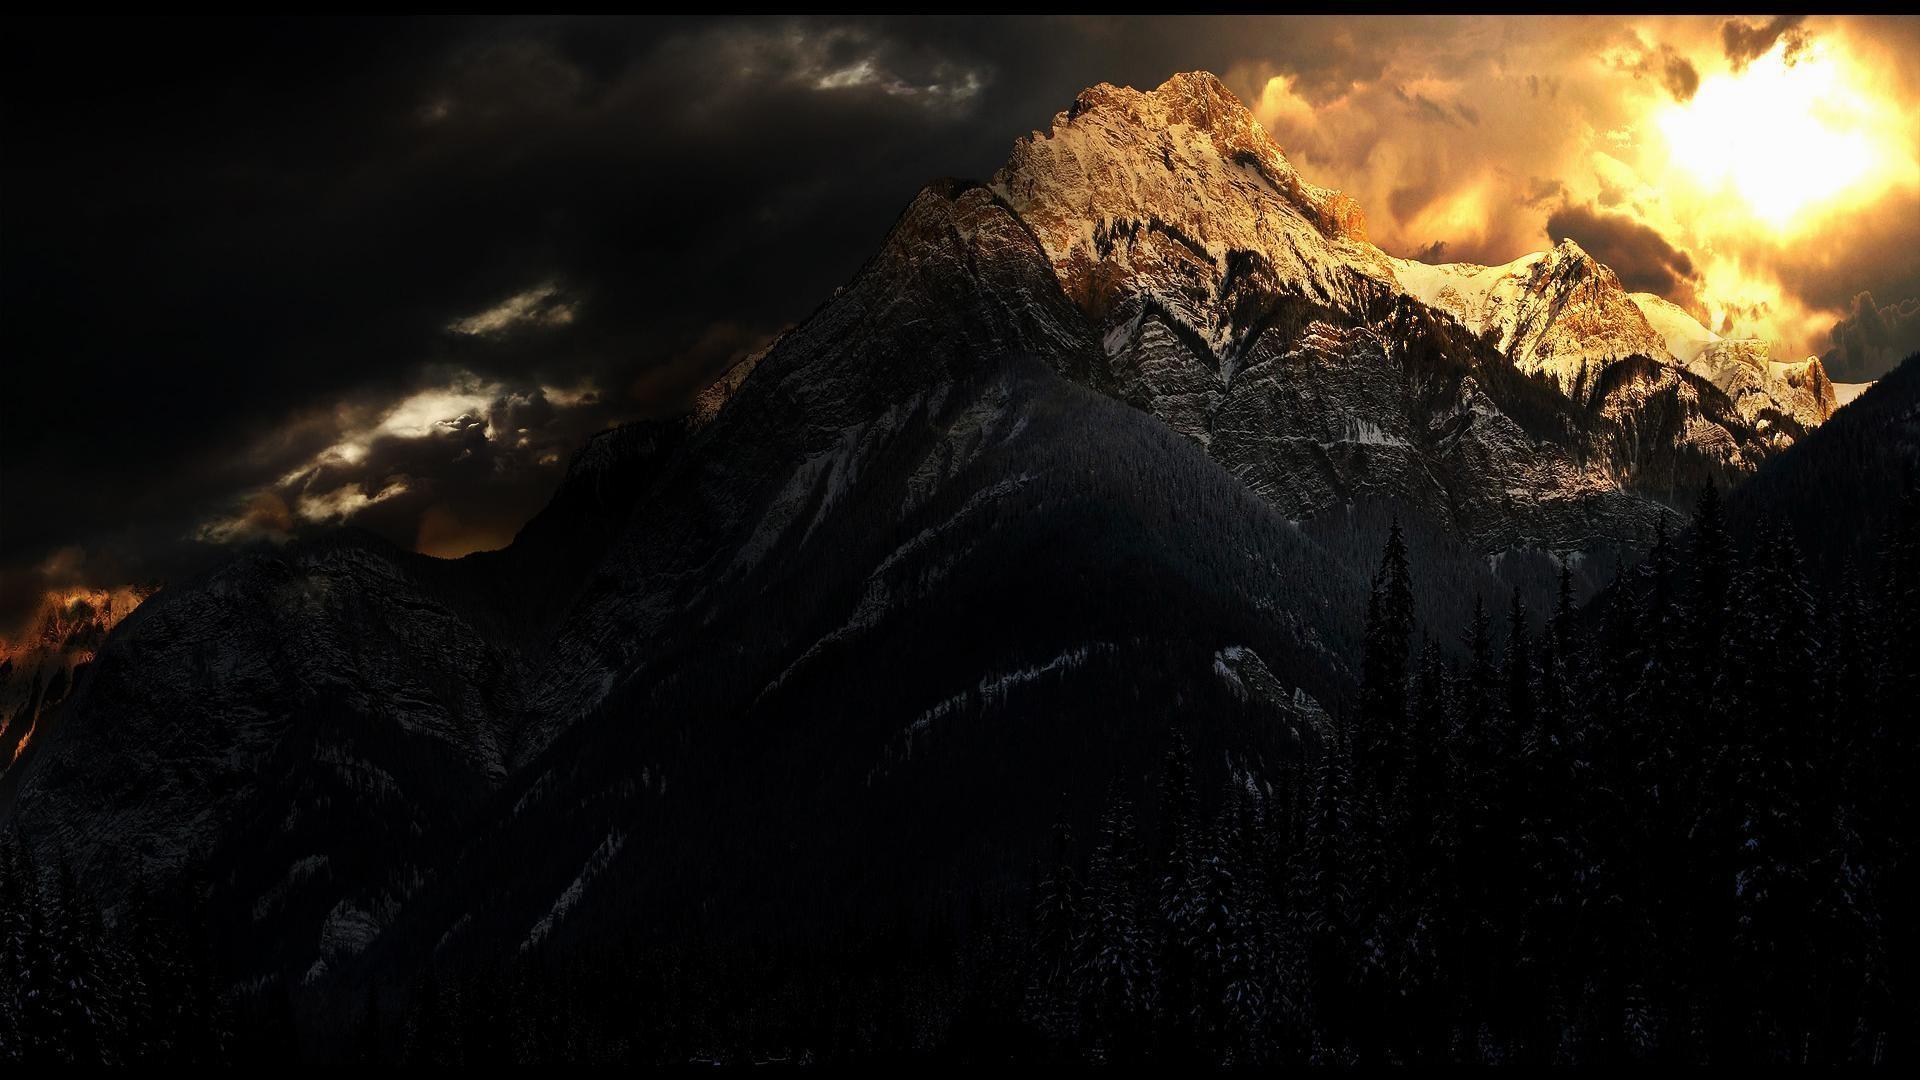 3daafbcbffde-mystic-mountain-mountain-sunset-wallpaper-wp640644